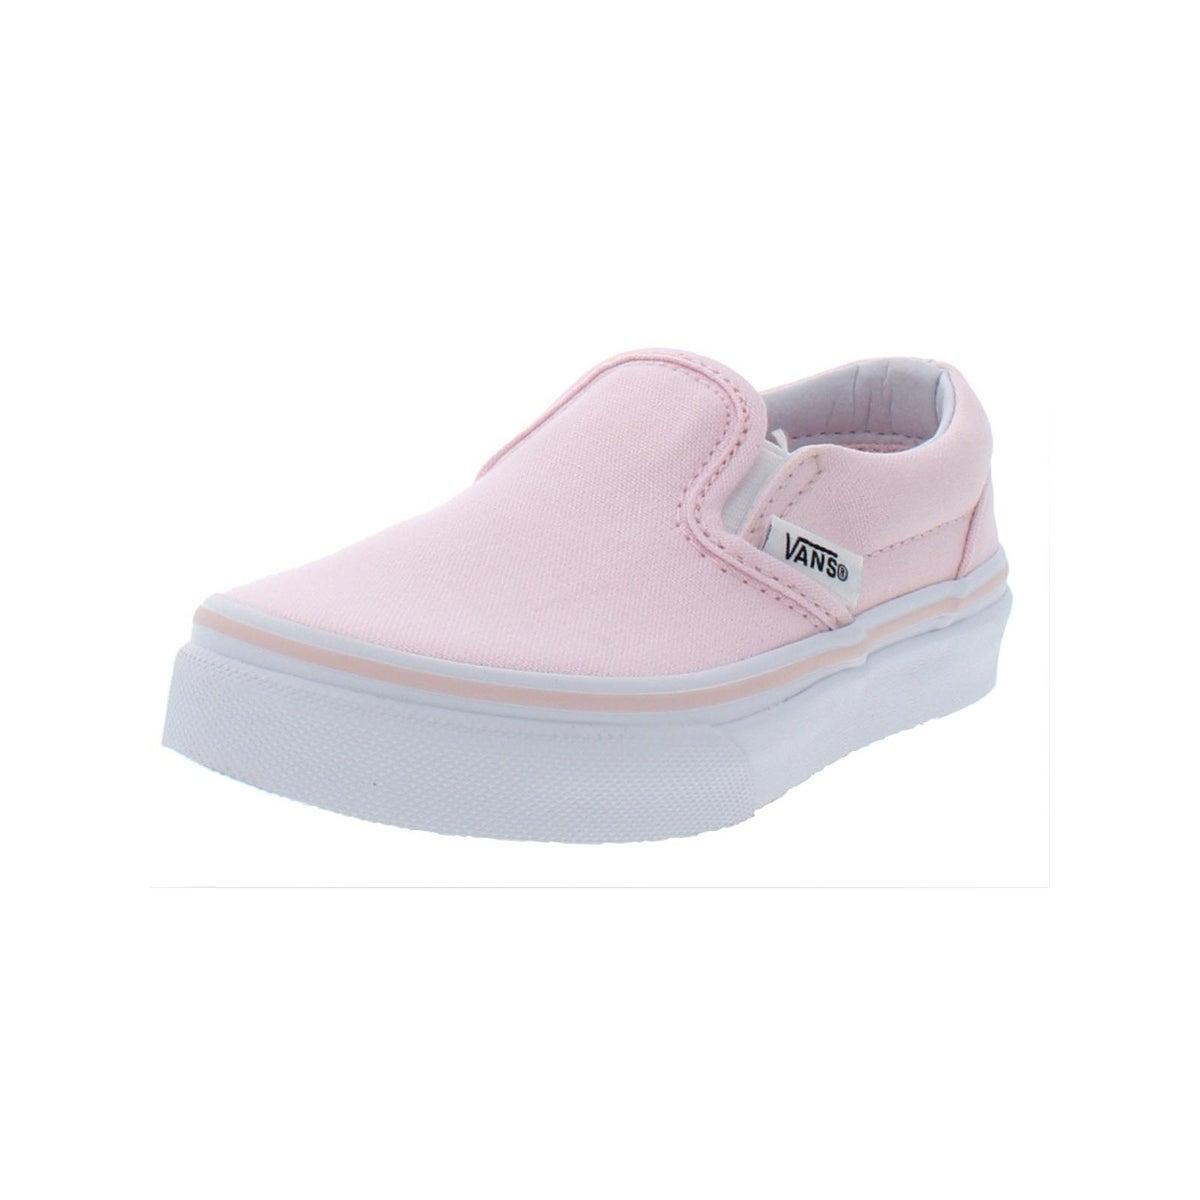 9feea266c8 Vans Boys  Shoes